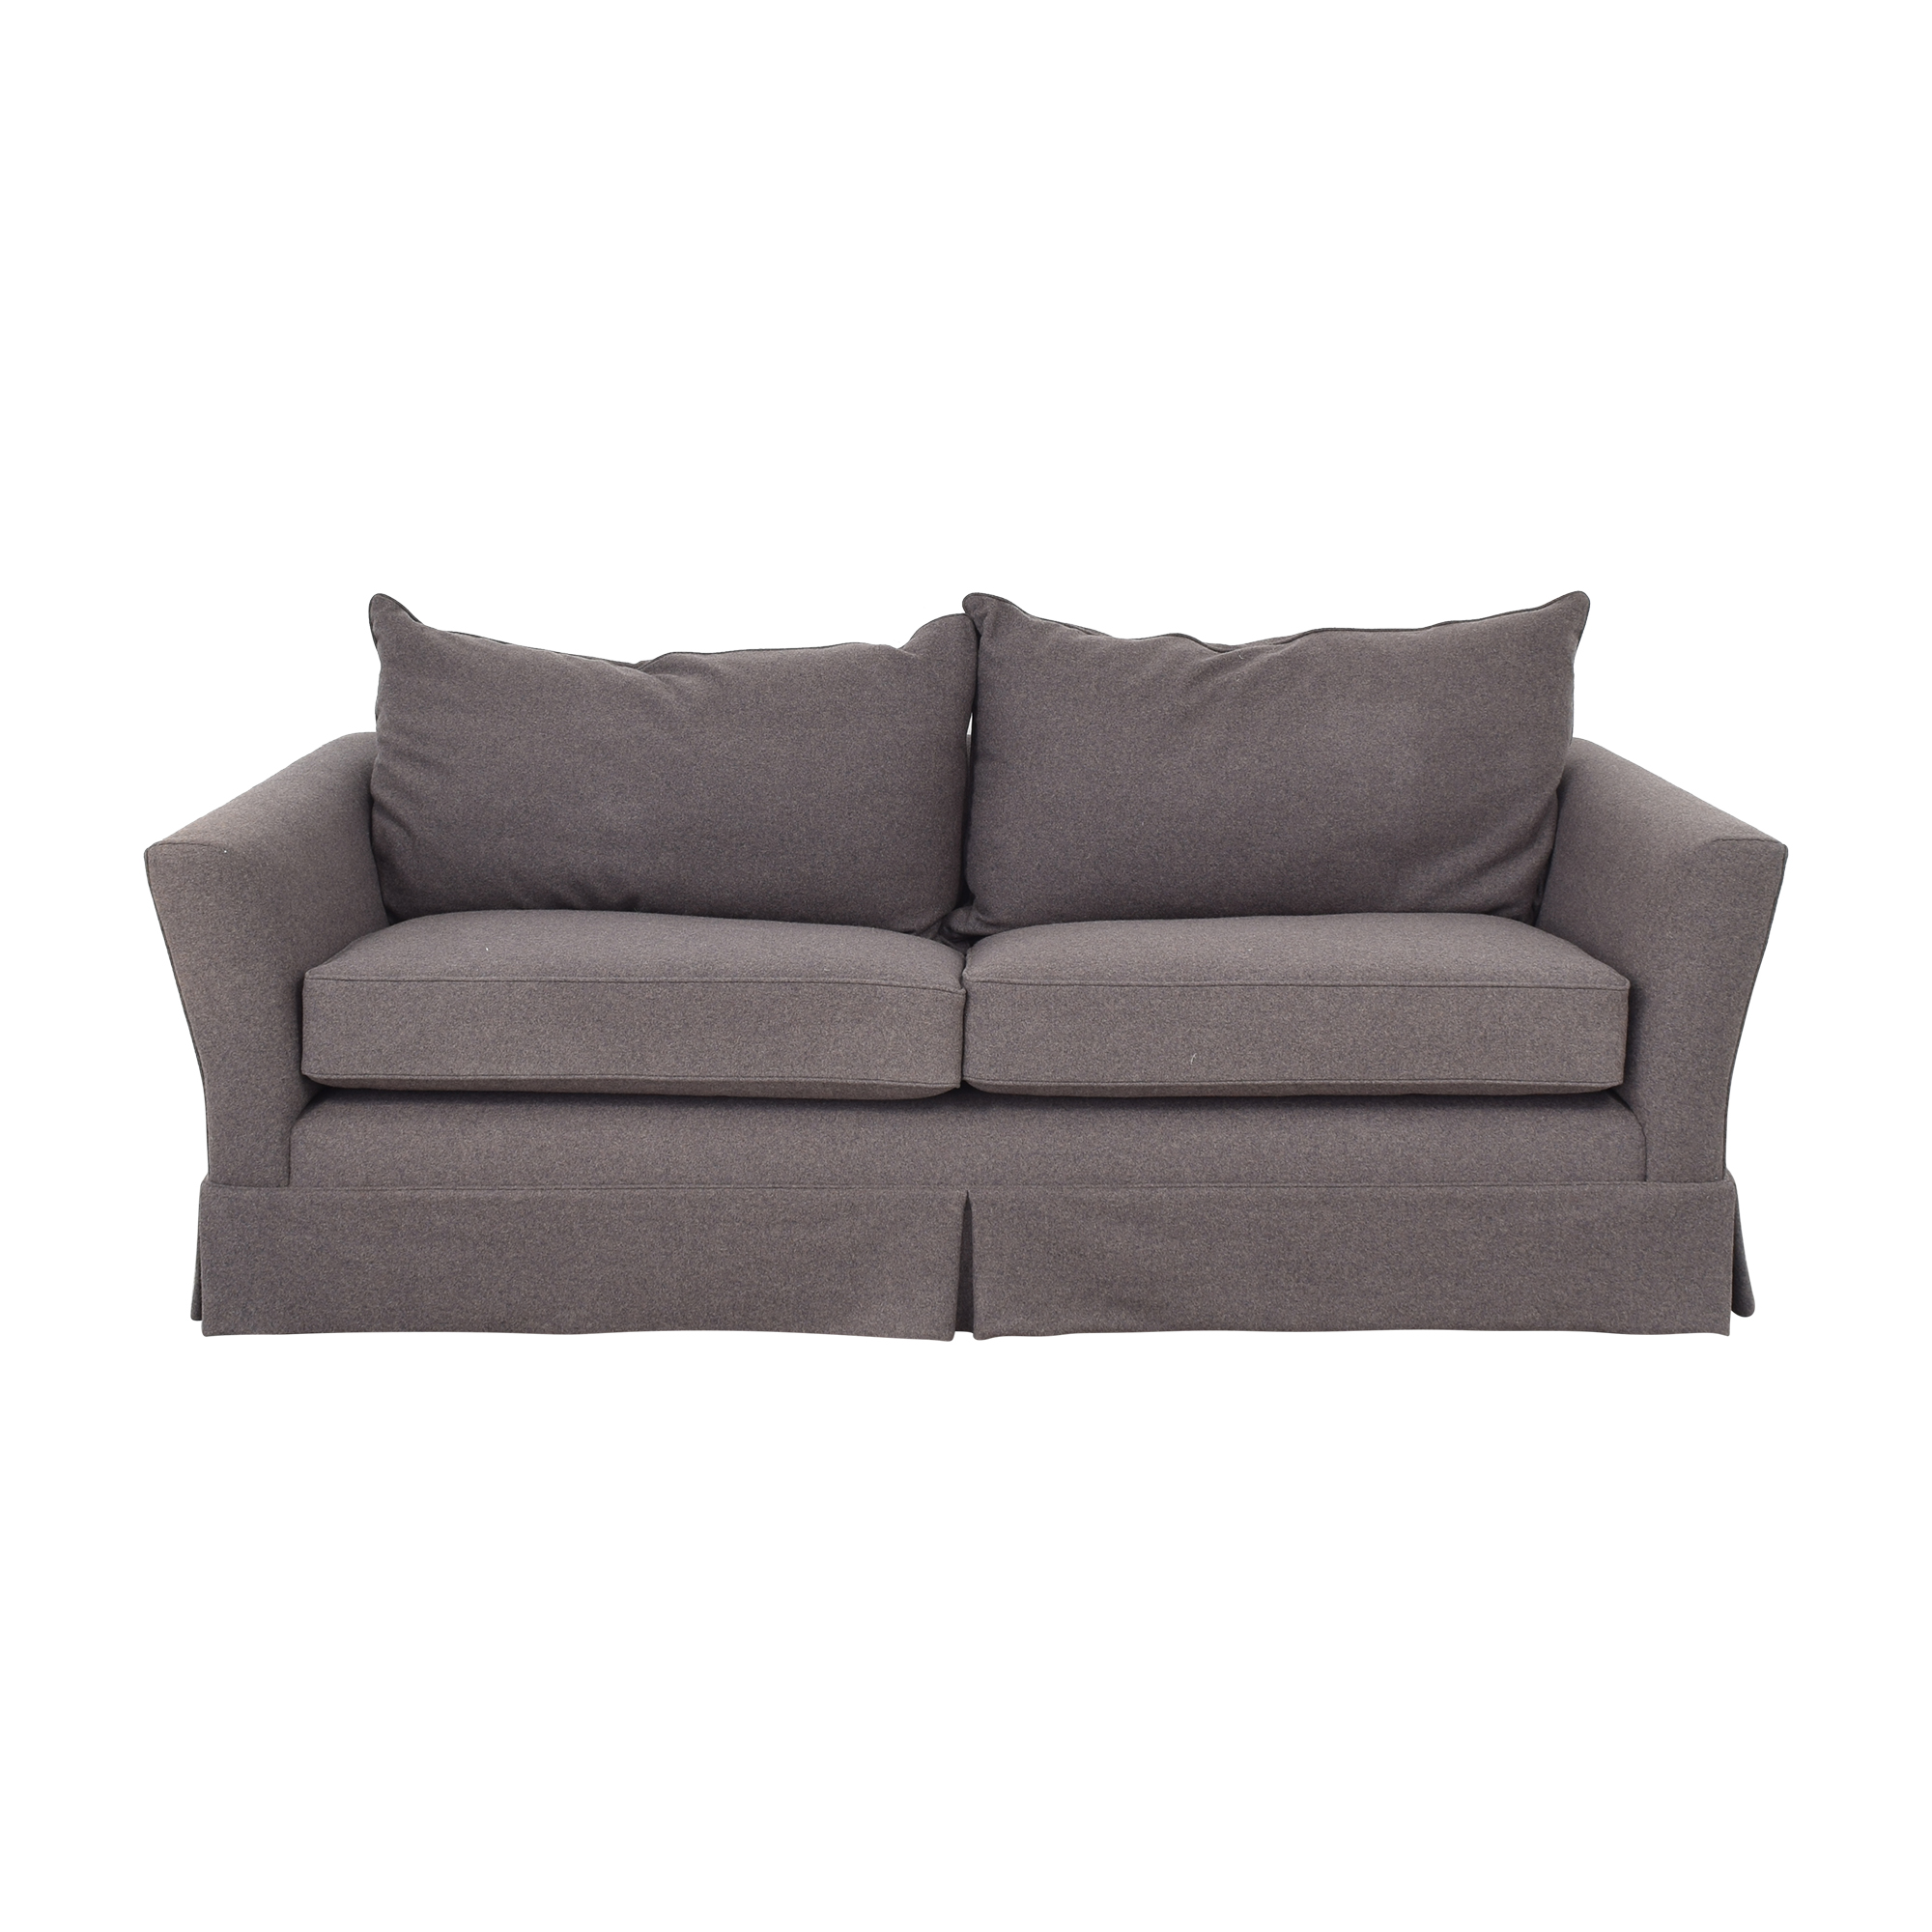 buy Rachel Ashwell Shabby Chic Rachel Ashwell Shabby Chic Sofa Bed online